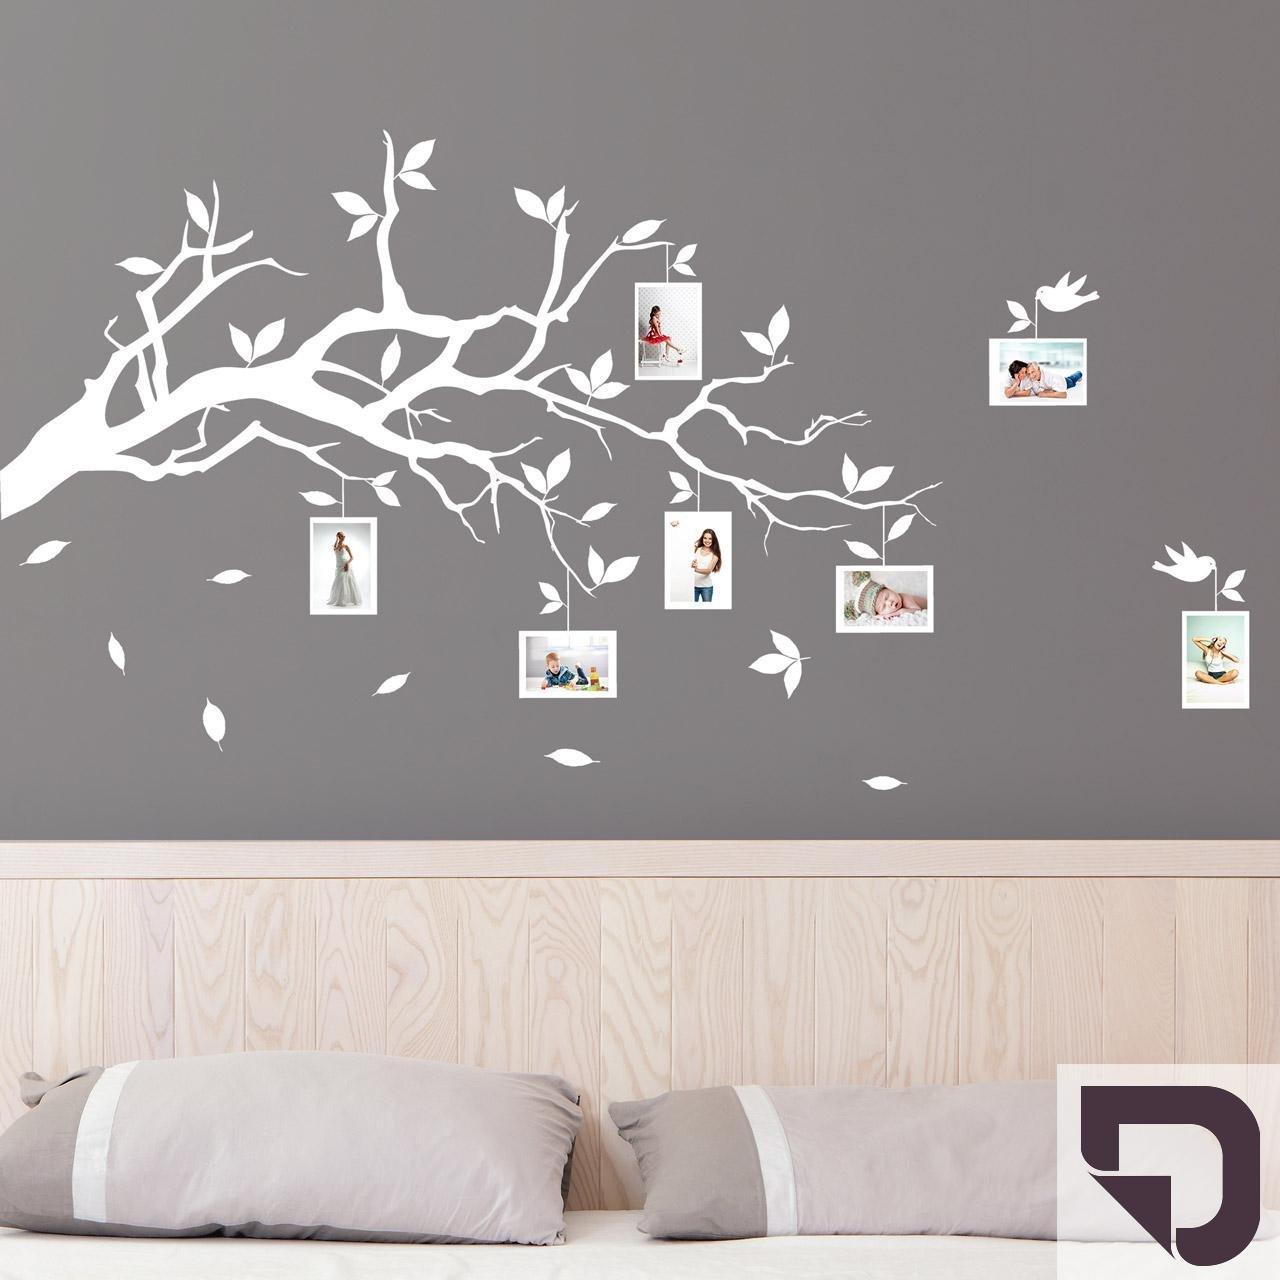 DESIGNSCAPE® Wandtattoo Ast mit Fotorahmen 120 x x x 72 cm (Breite x Höhe) schwarz DW804006-M-F4 B01H489A6K Wandtattoos & Wandbilder c812b6